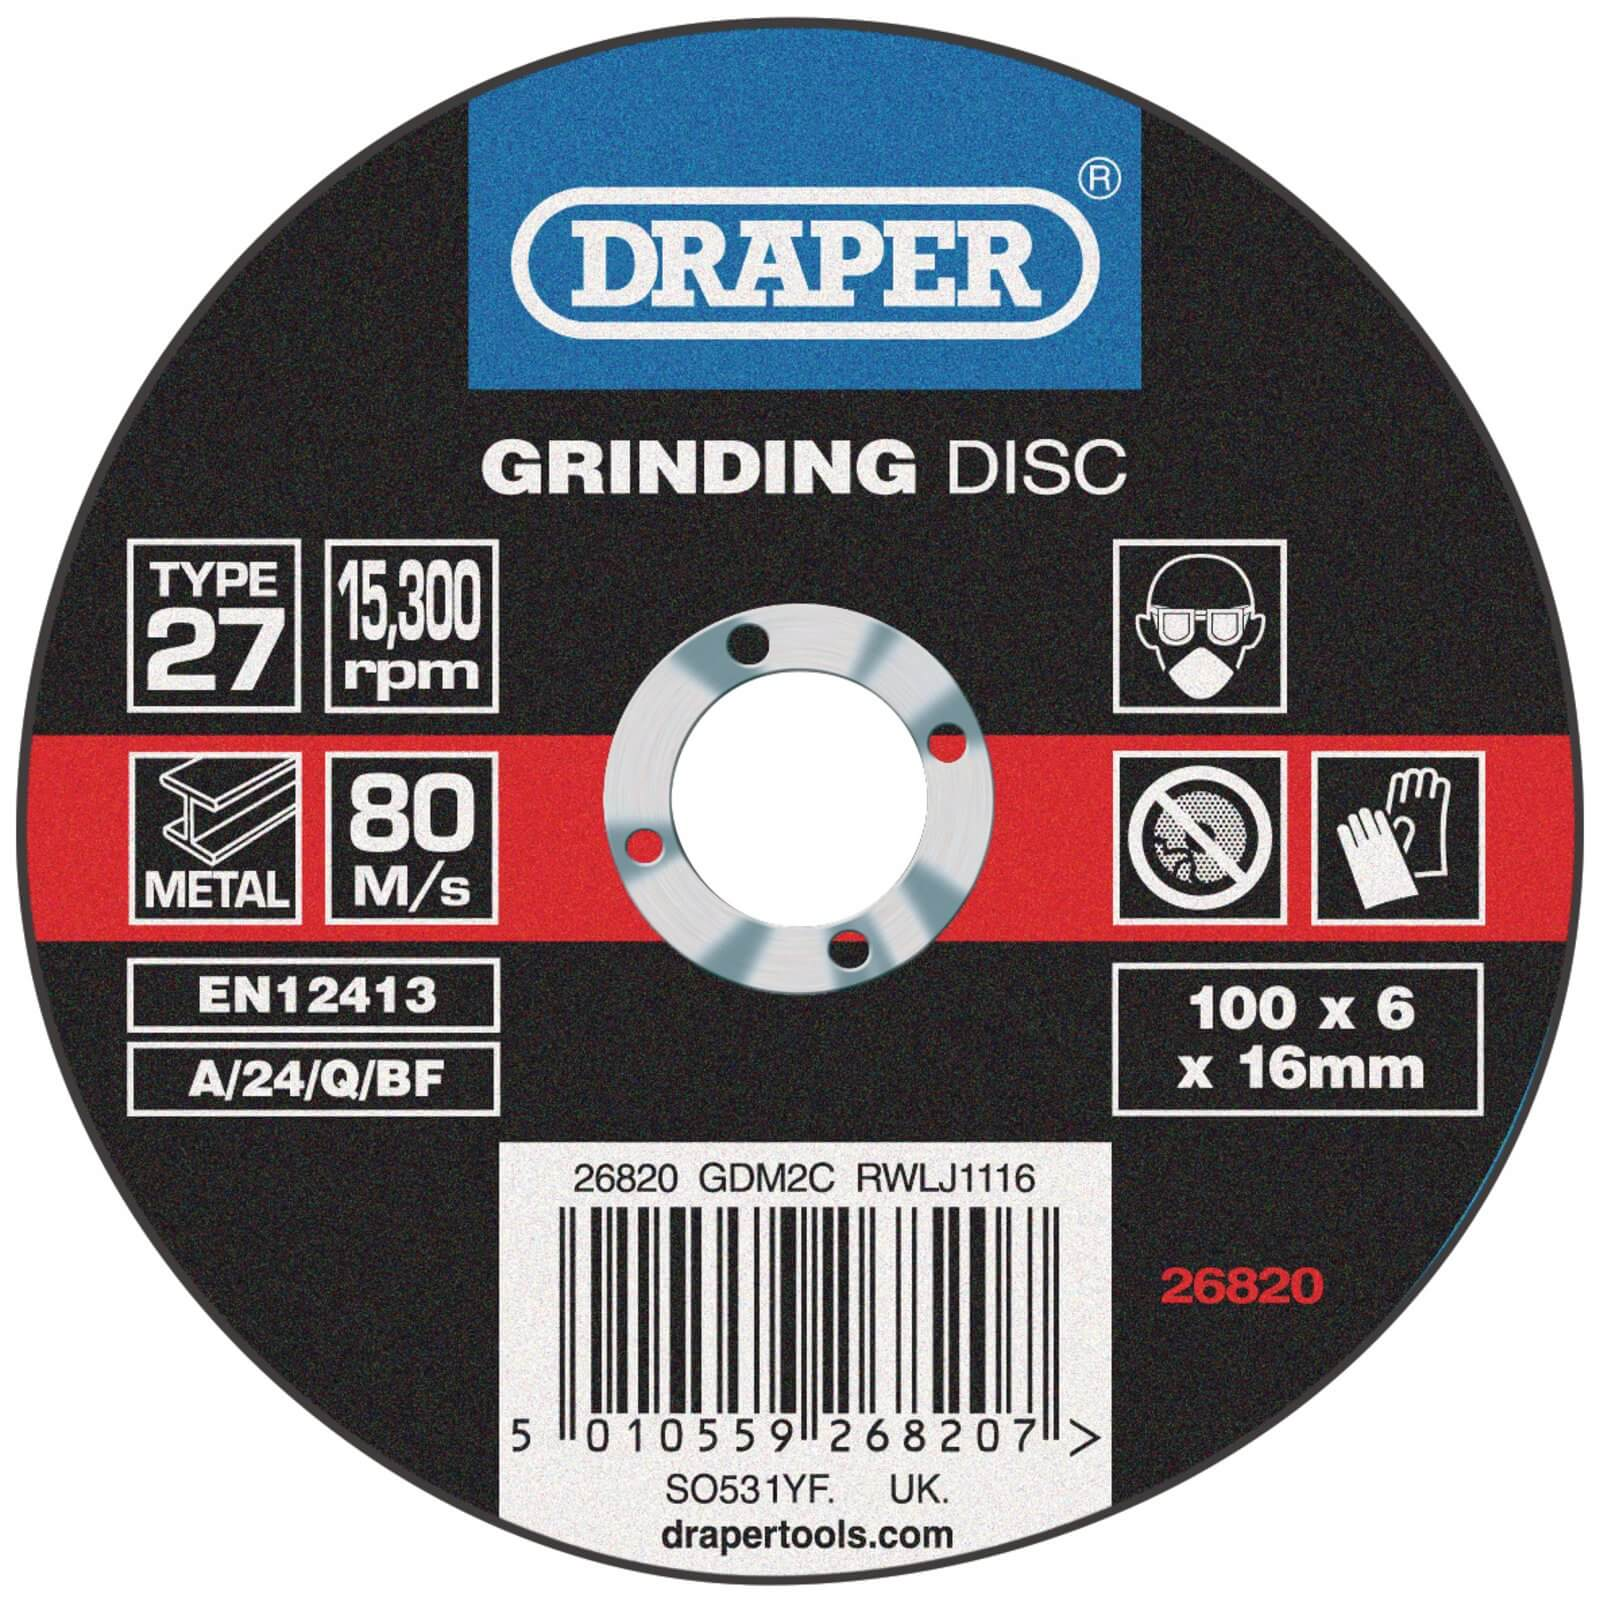 Image of Draper Depressed Centre Grinding Disc 100mm 6mm 16mm